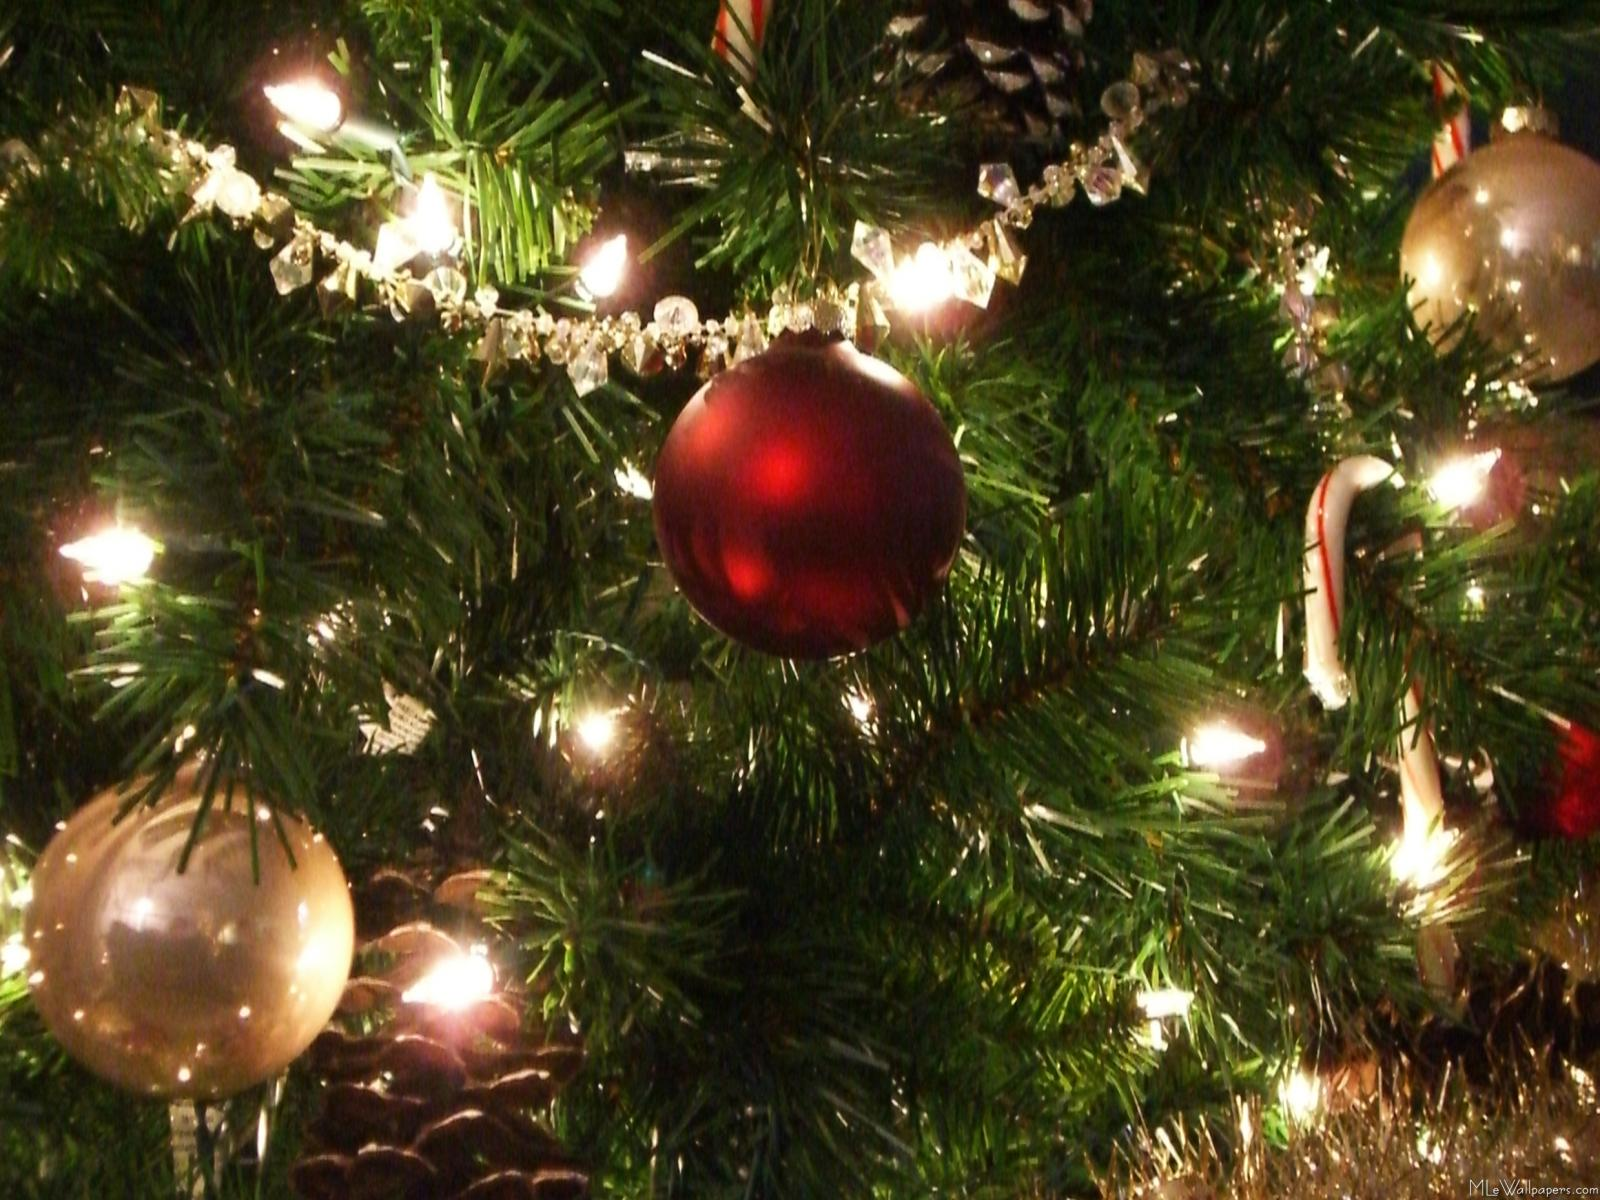 Albero Di Natale Hd.Sfondi Desktop Hd Natale Albero Di Natale Sfondi Hd Gratis